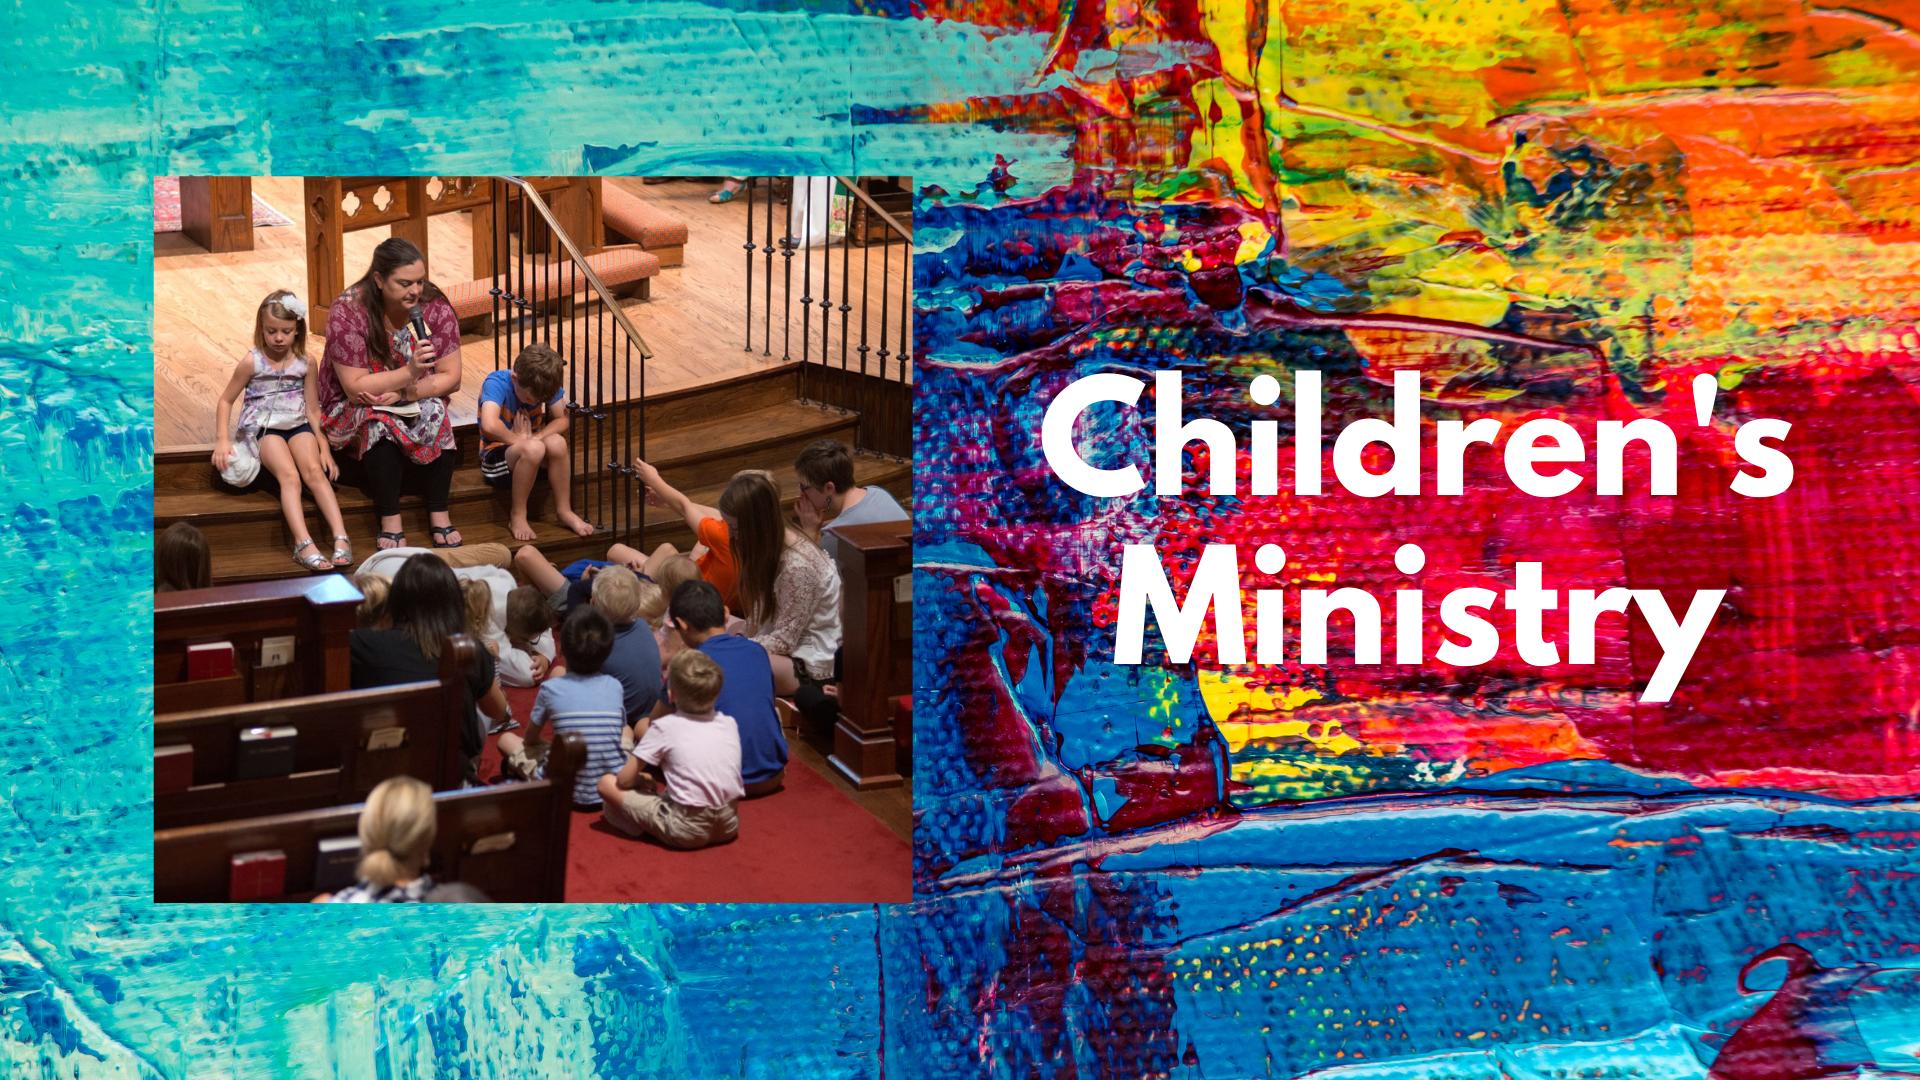 childrens-ministry-1_997